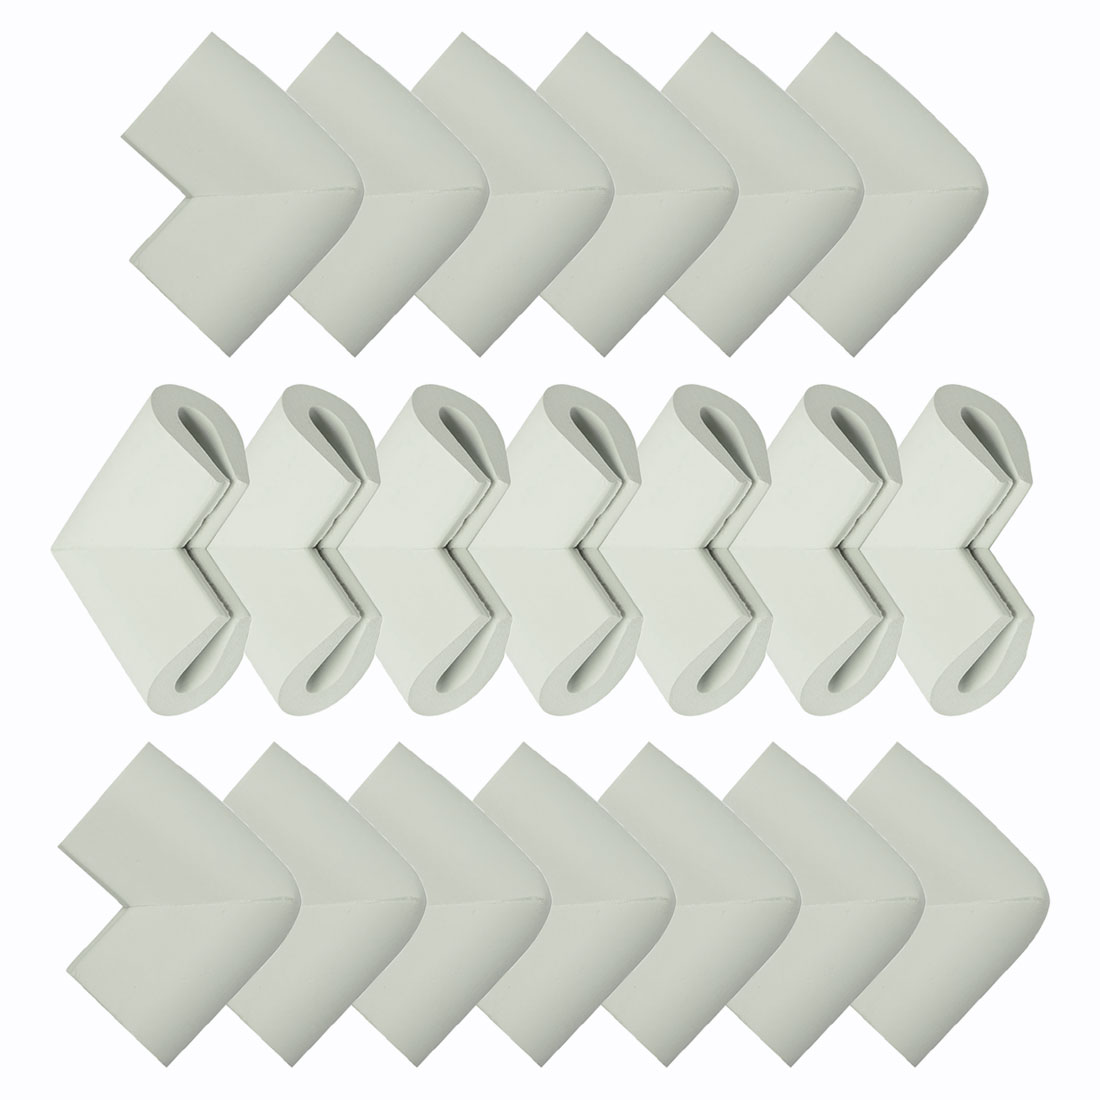 Desk Edge Foam U Shape Corners Cushion Guard Strip Bumper Protector 20pcs Grey